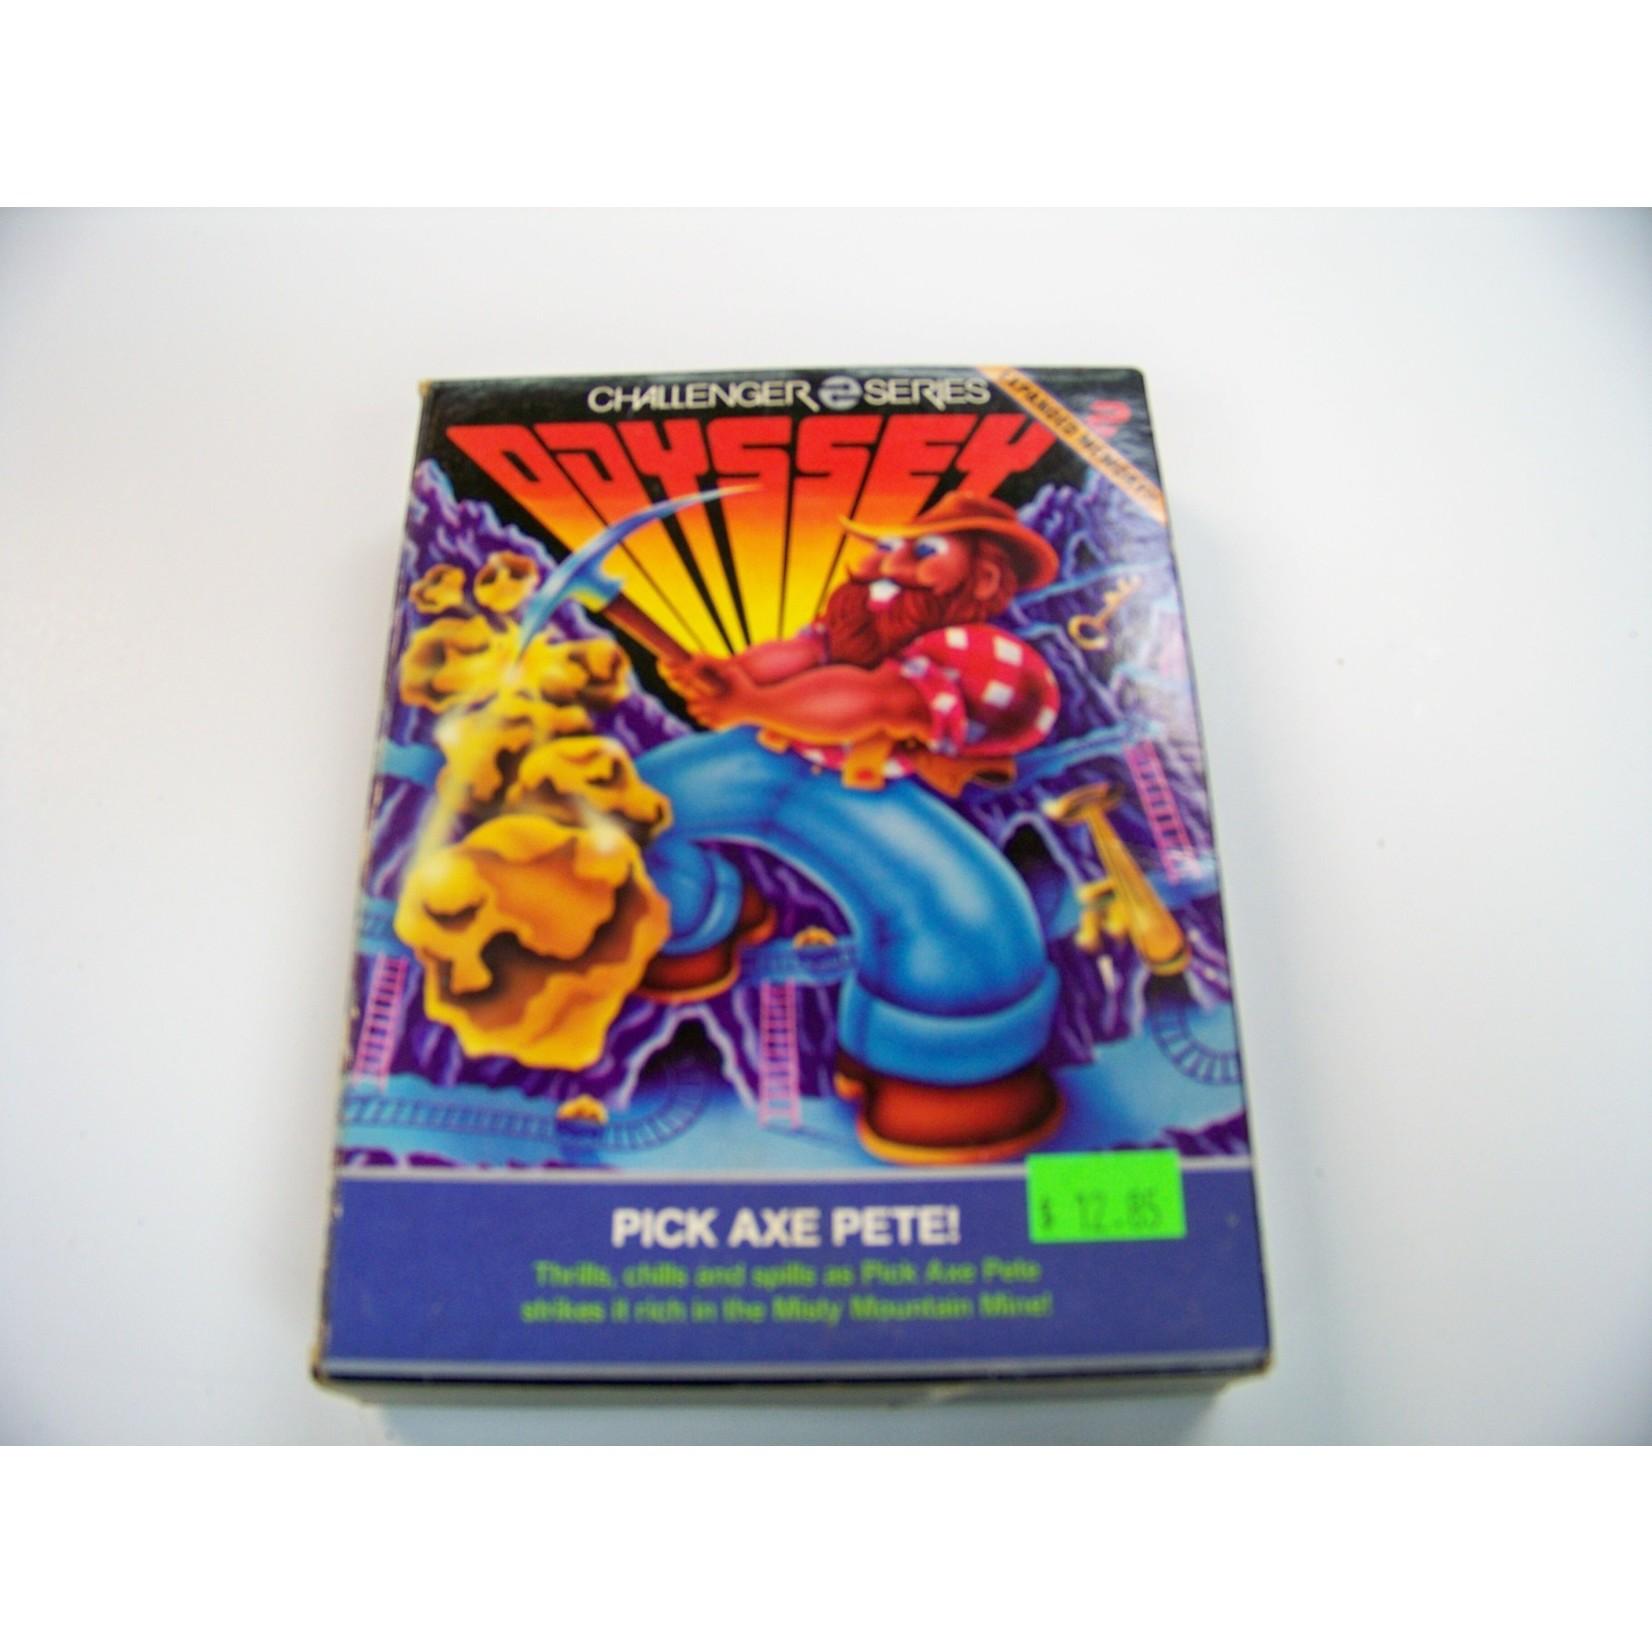 OD2U-Pick Axe Pete (BOXED)